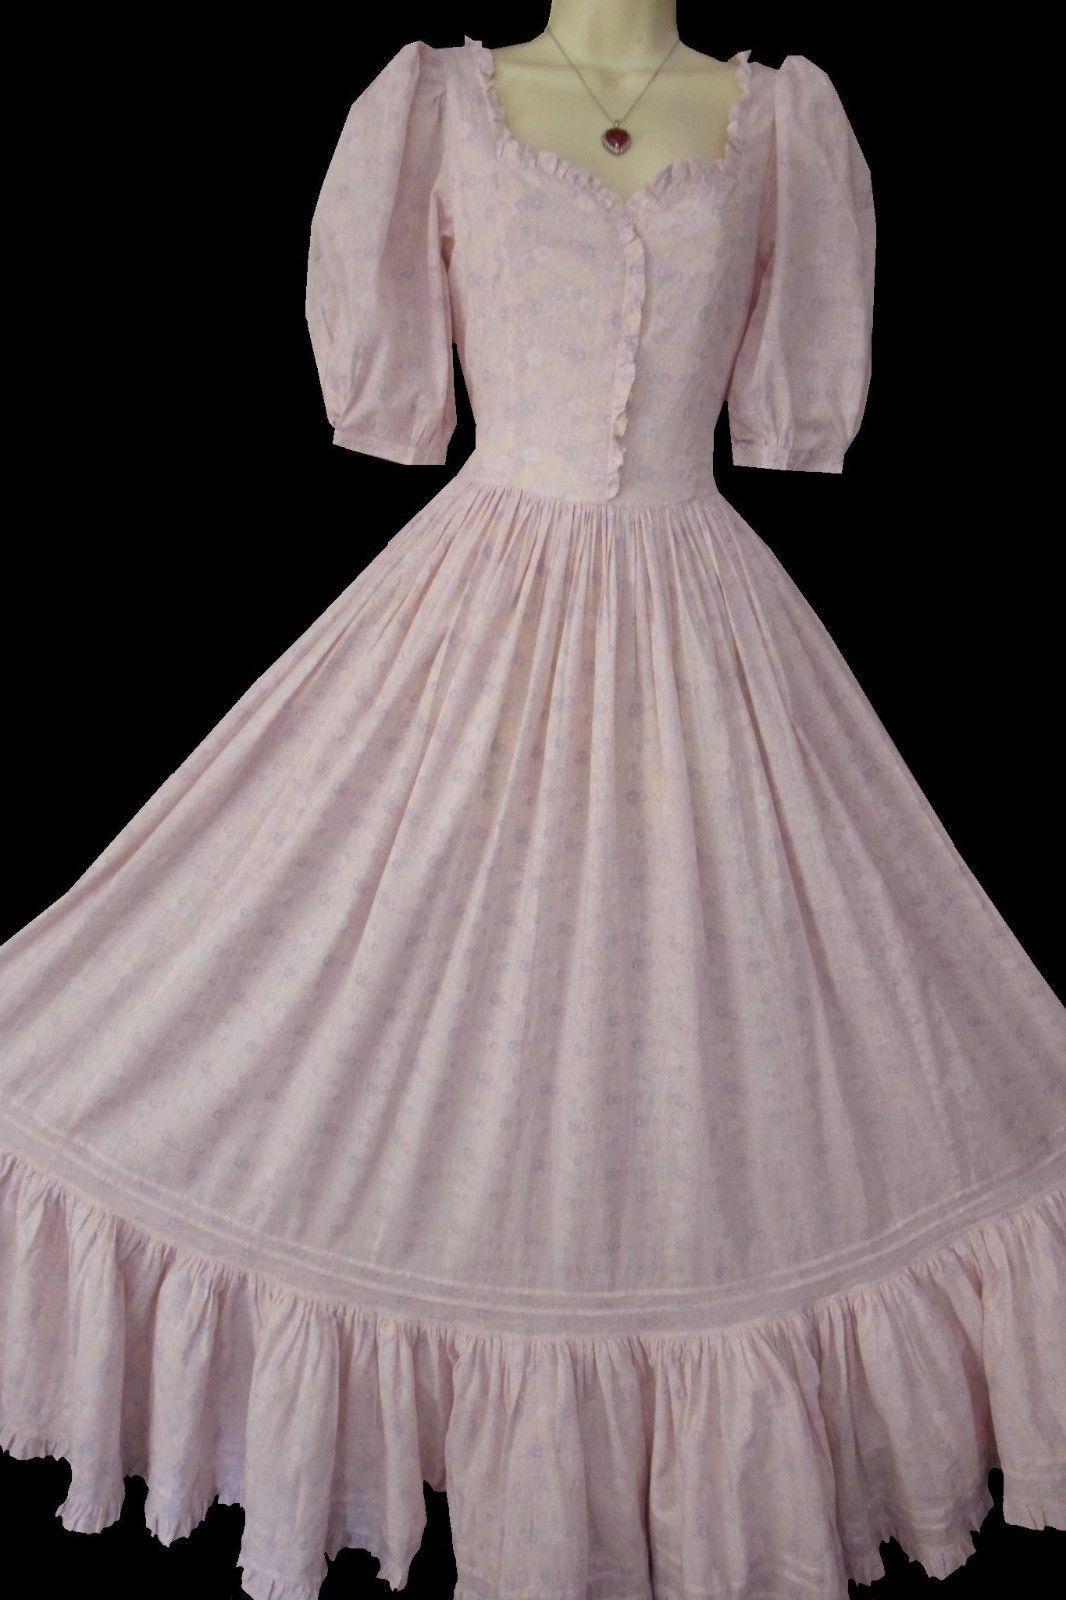 Rare Vintage Laura Ashley Victorian Style Pink Floral Maxi Dress Uk 8 10 Pink Floral Maxi Dress Floral Maxi Dress Victorian Fashion [ 1600 x 1066 Pixel ]